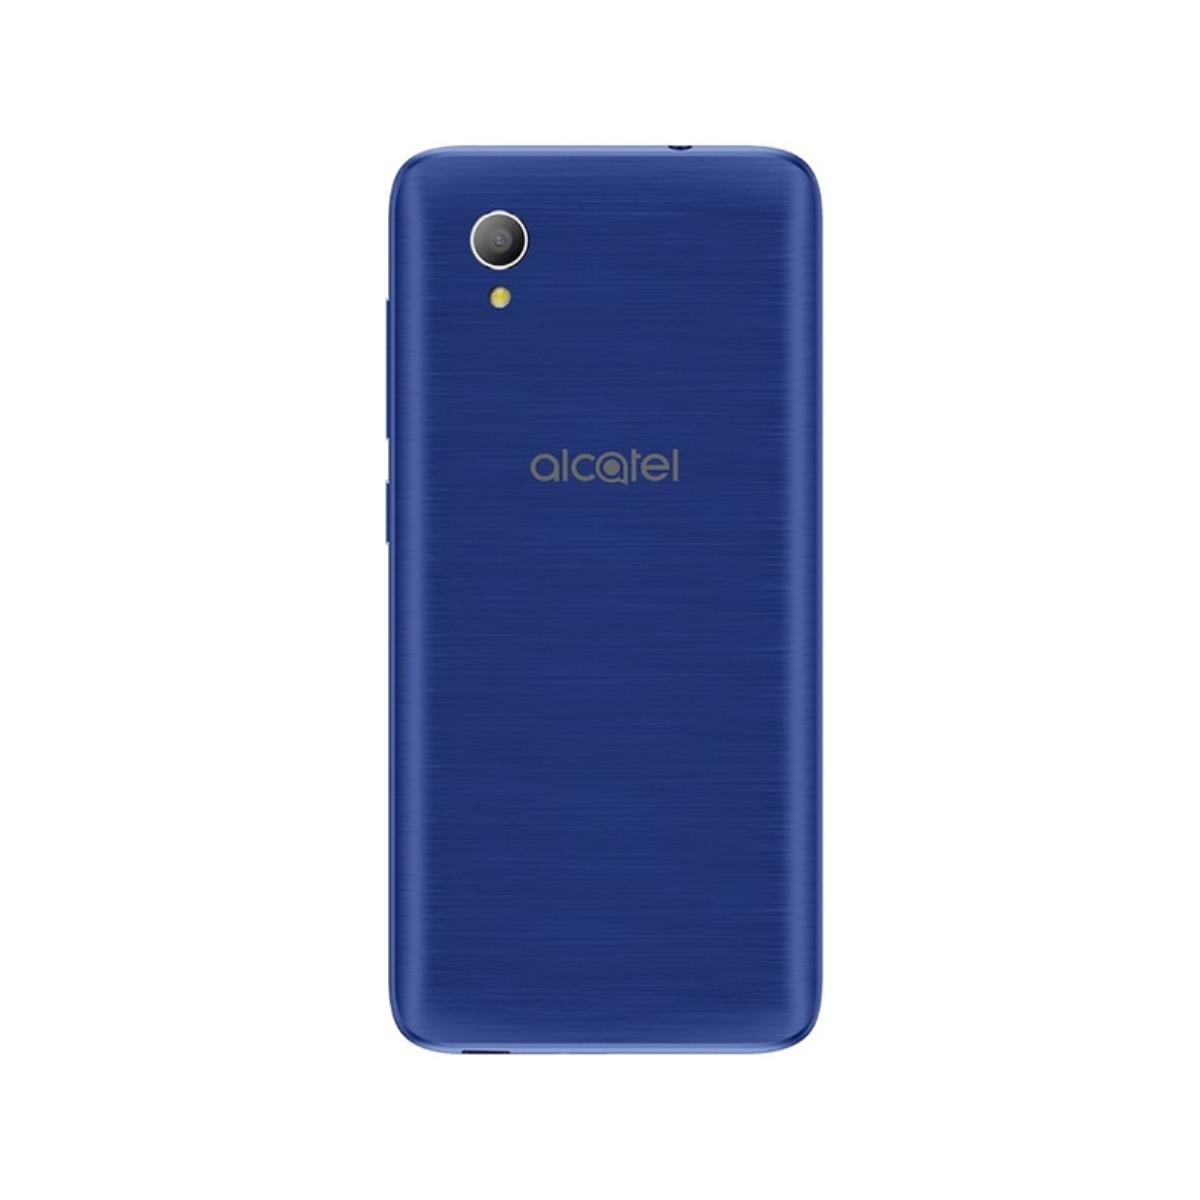 HUAWEY Y6 2018 16GB/2GB DUAL SIM BLACK